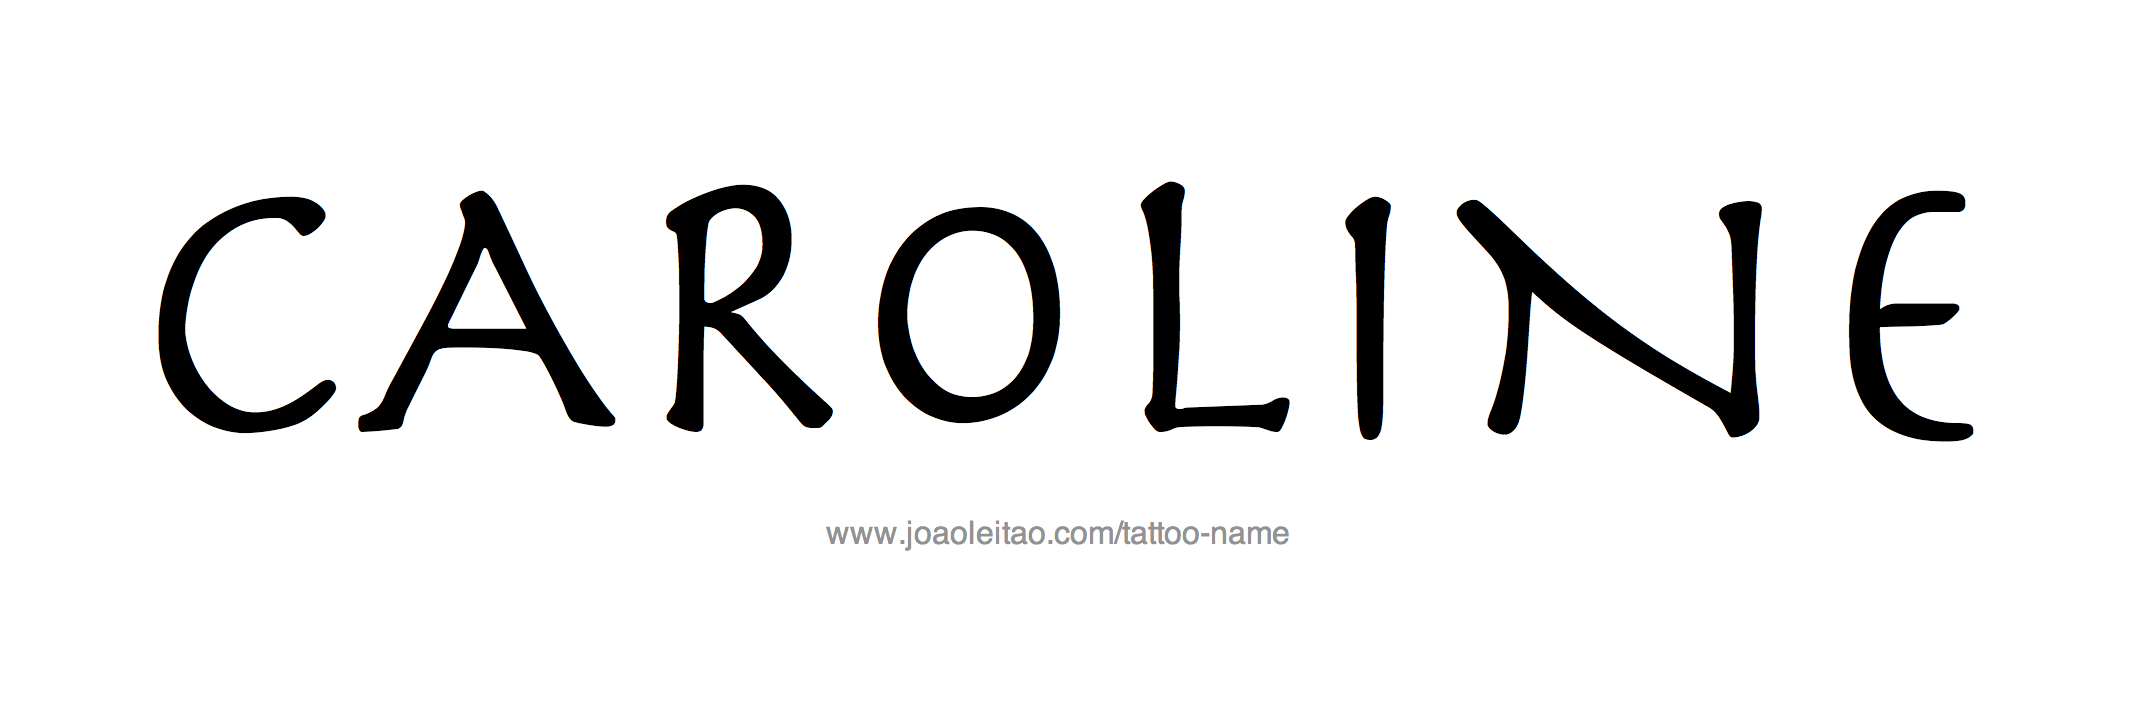 %name%: Caroline Name Tattoo Designs